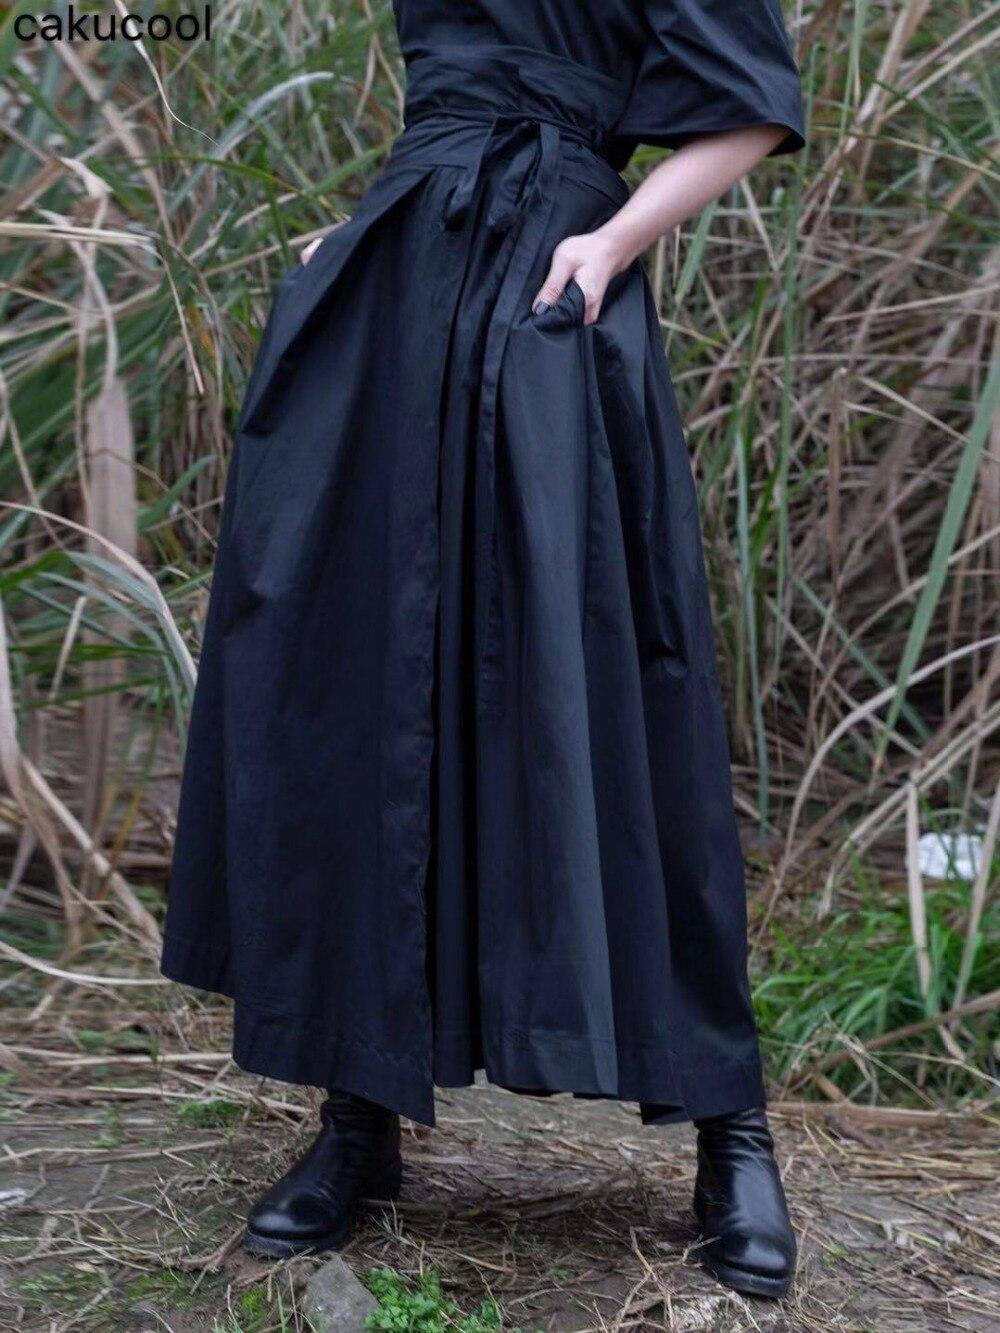 Cakucool 새 여성 일본식 스커트 가을 비대칭 디자이너 블랙 스트라이프 찢어진 가장자리 streetwear 미디 스커트 여성용-에서스커트부터 여성 의류 의  그룹 1